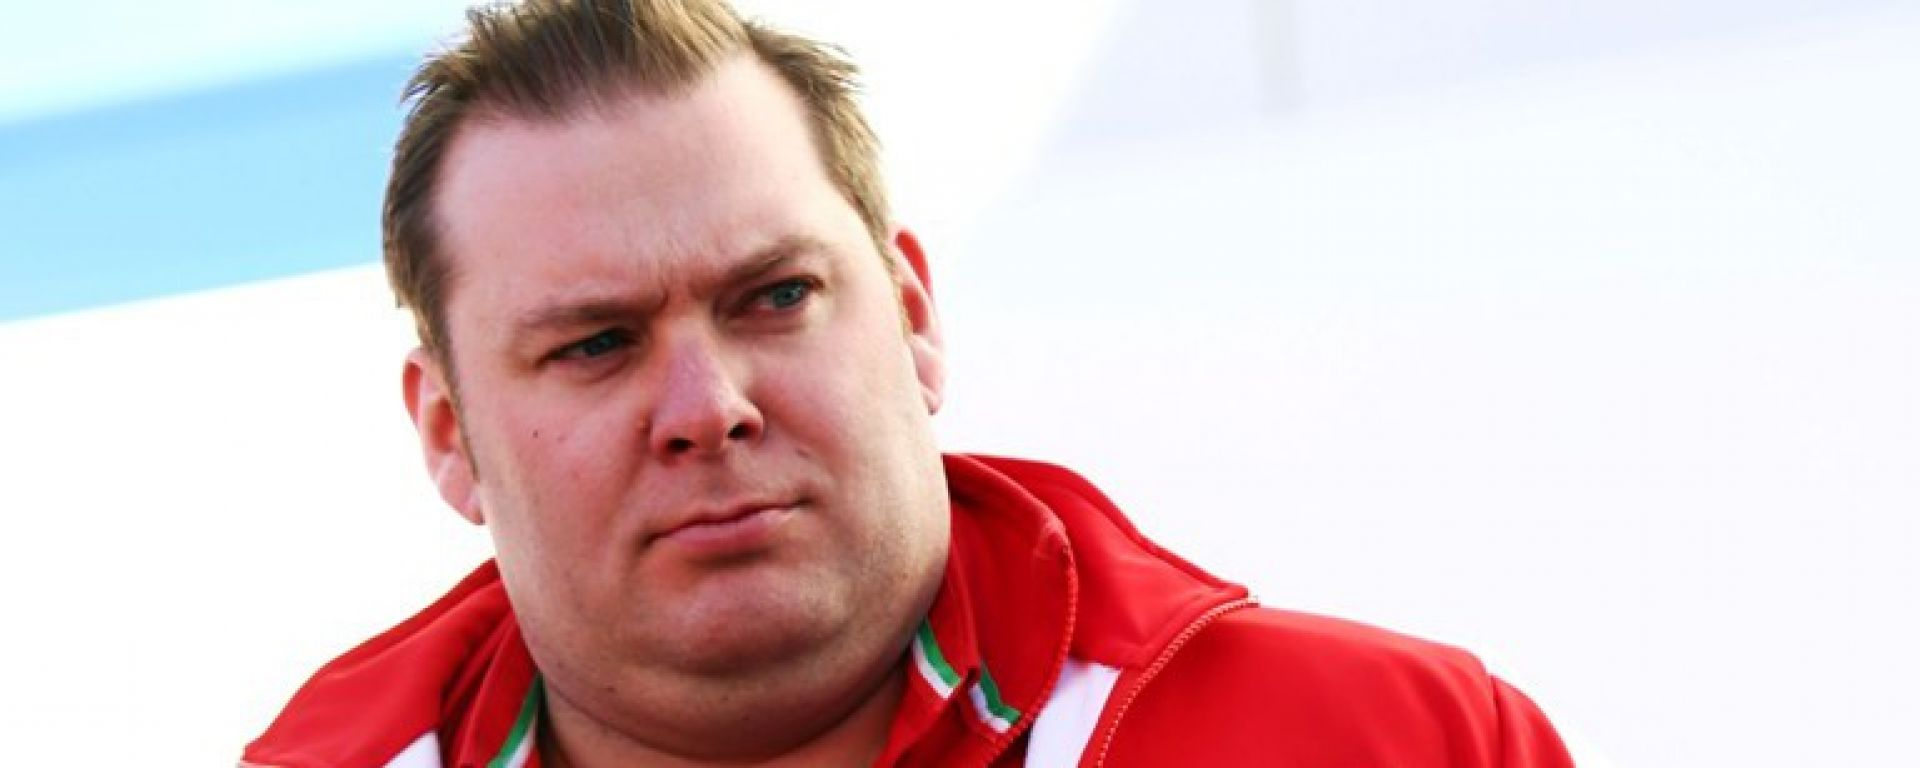 Dave Greenwood - Ingegnere di pista di Raikkonen in Ferrari